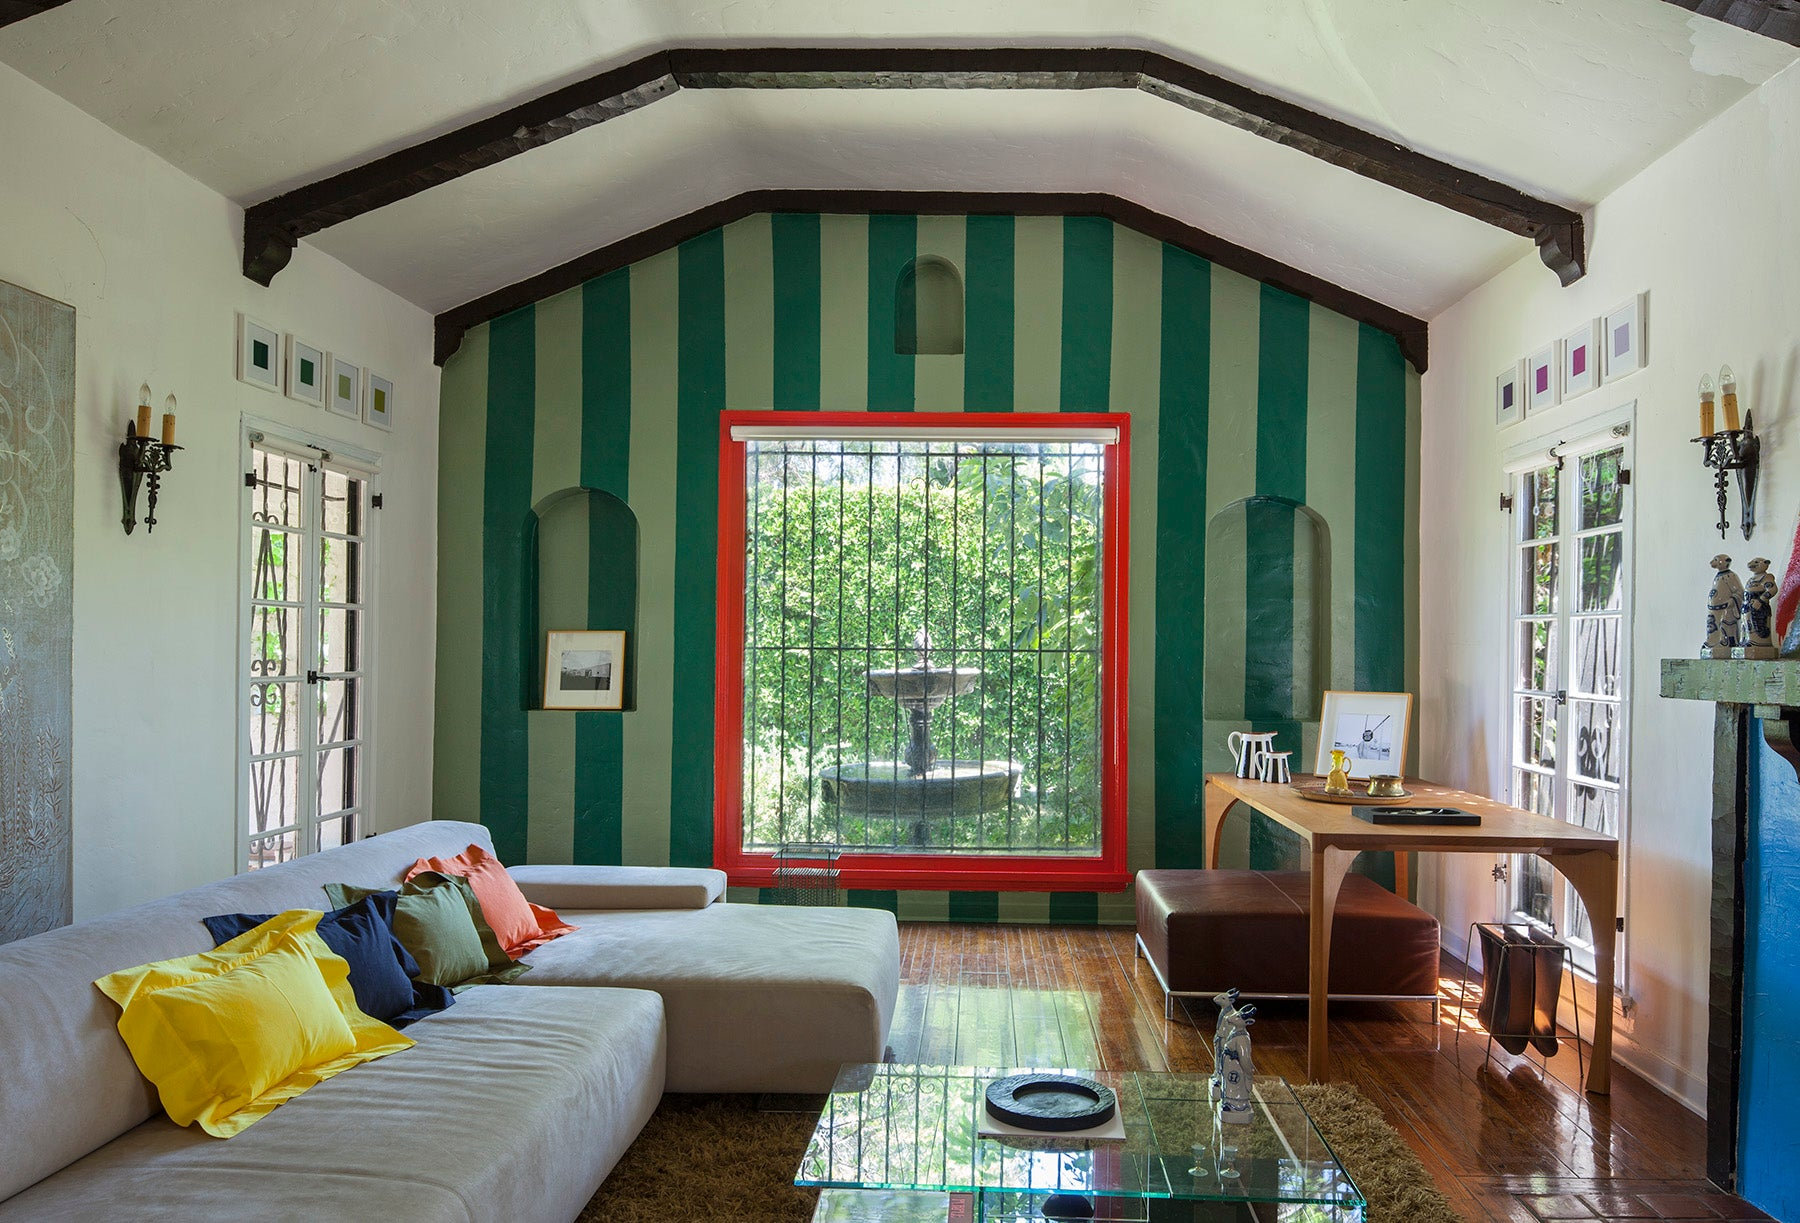 green-striped-walls-living-room